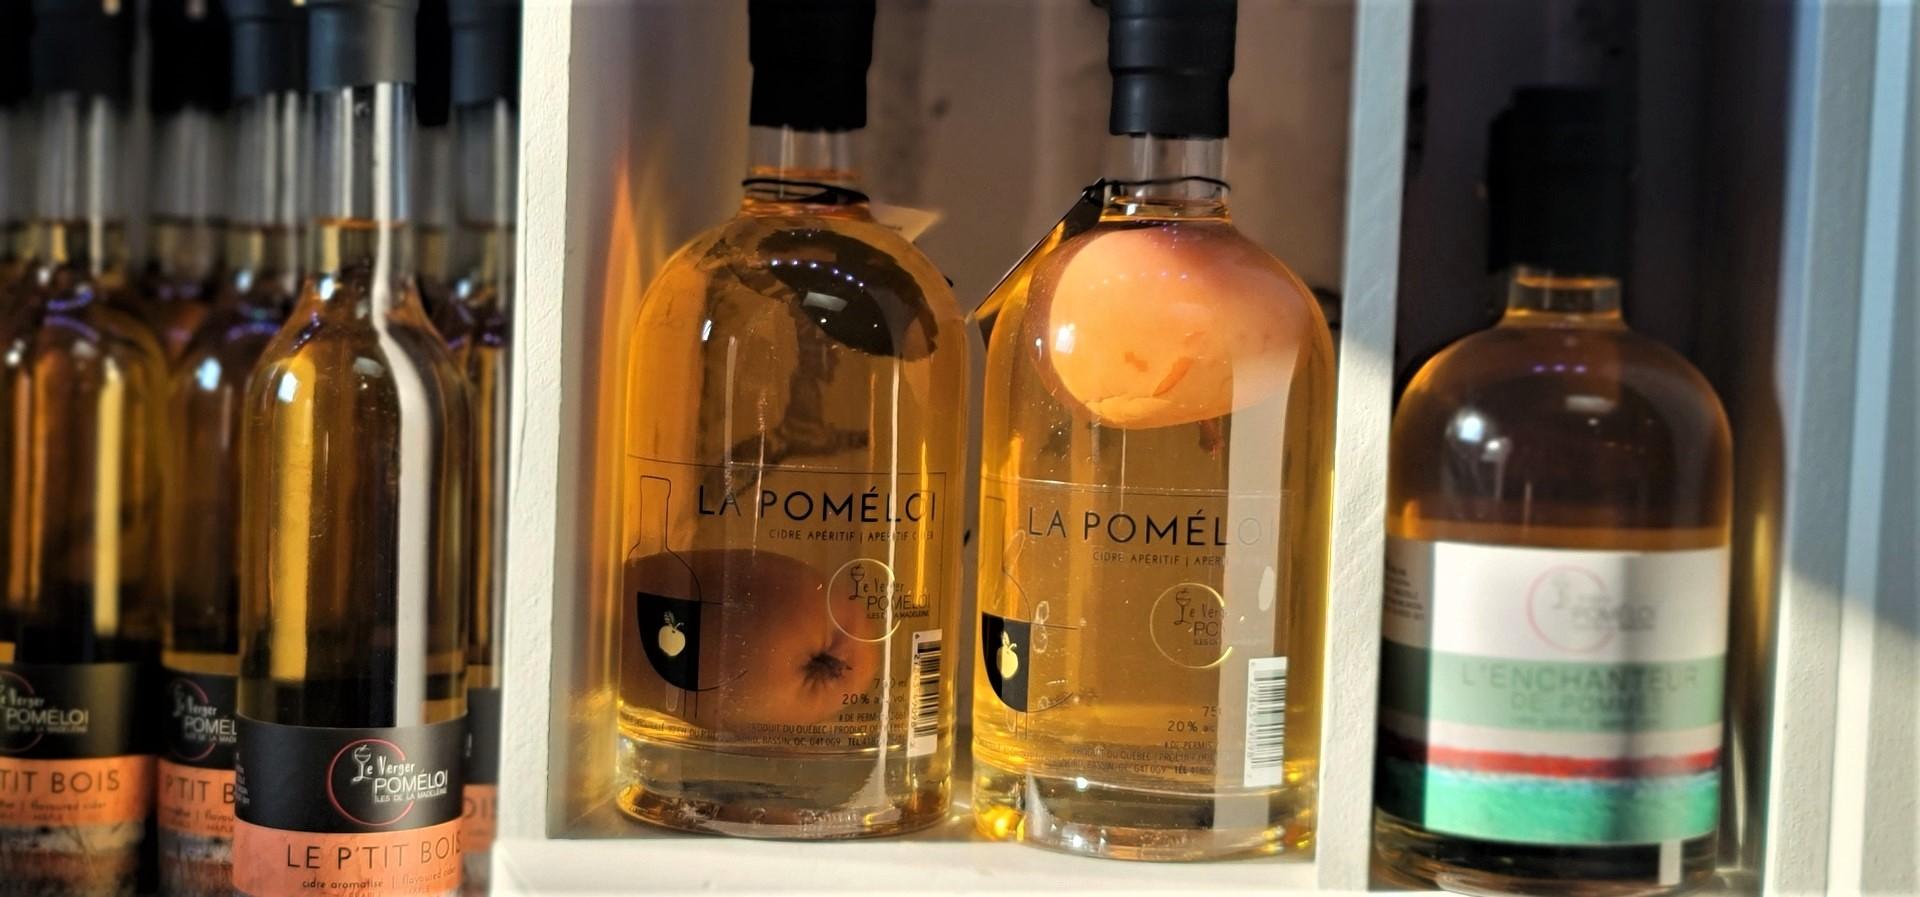 apples in bottles at Le Verger Poméloi